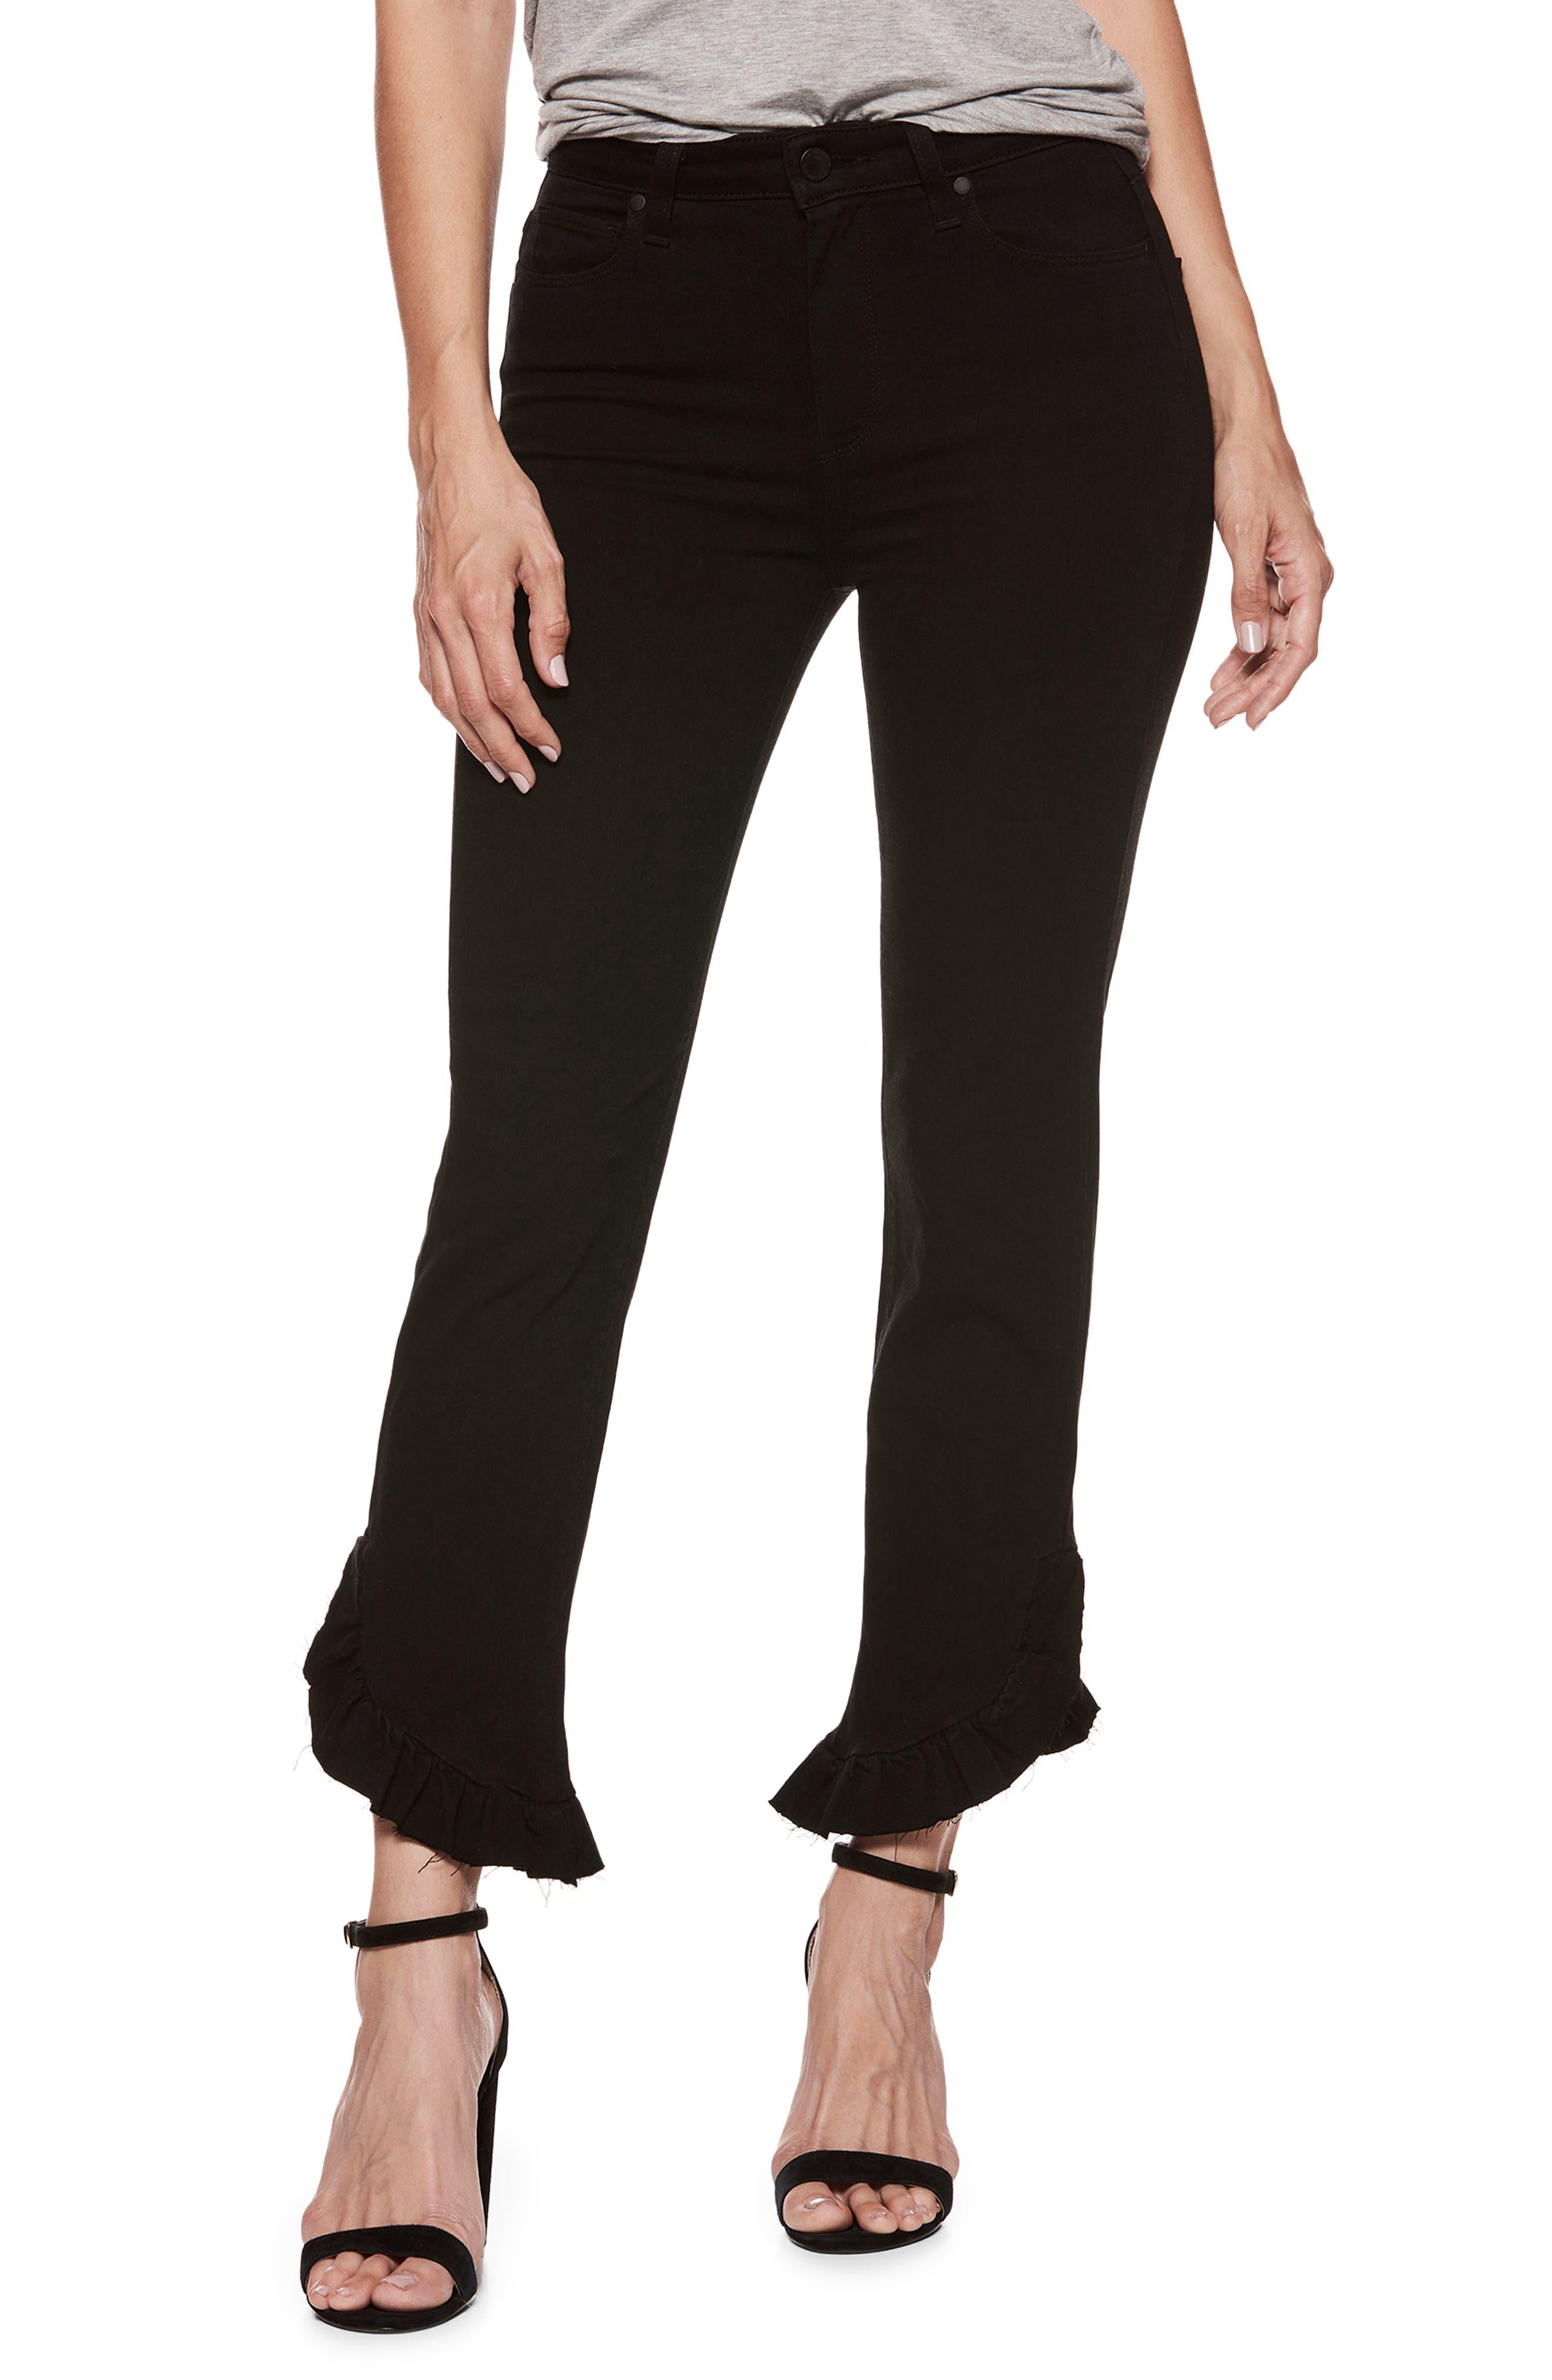 Transcend - Hoxton High Waist Ankle Straight Leg Jeans,                             Main thumbnail 1, color,                             Black Shadow